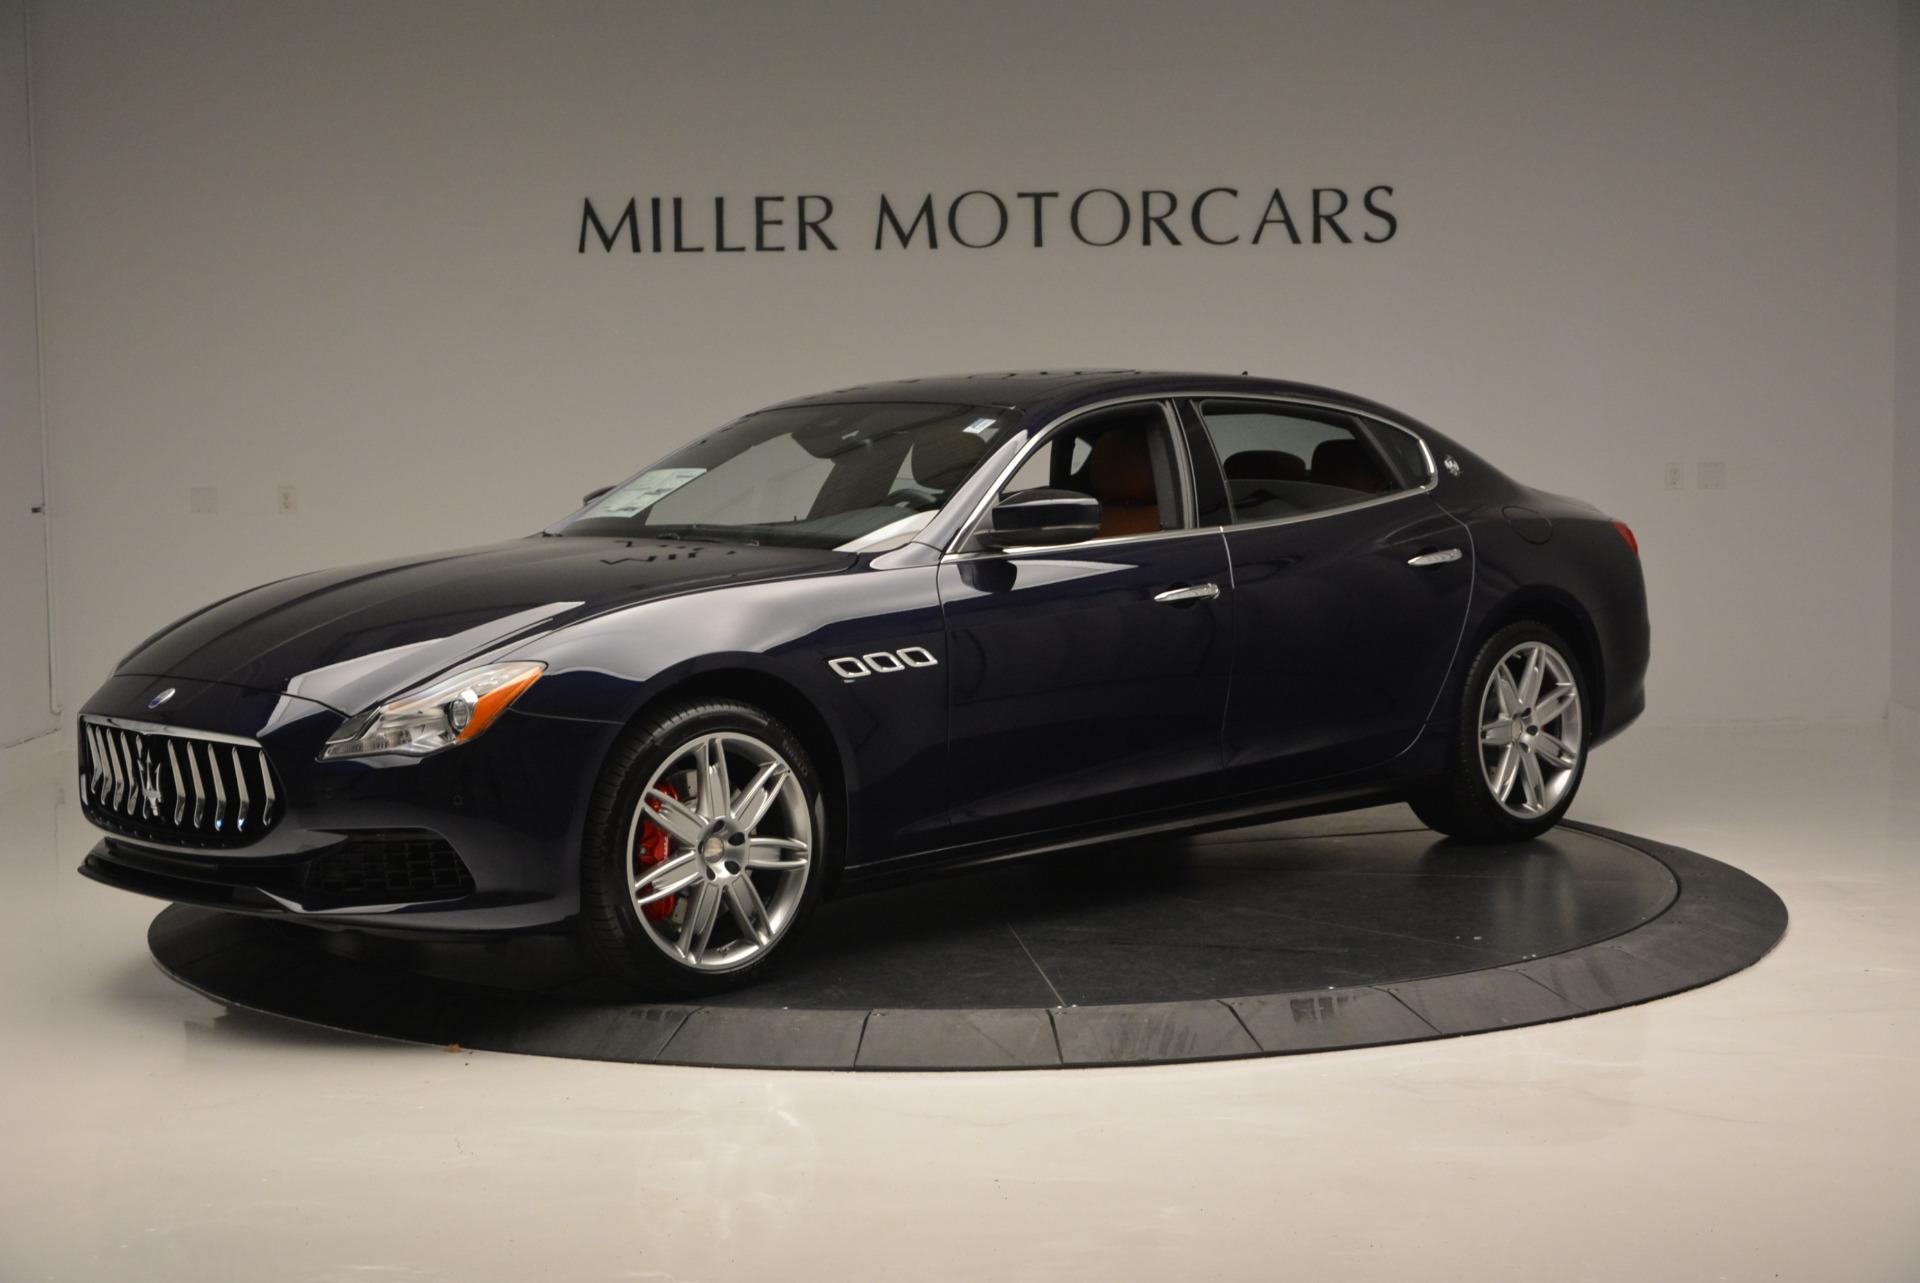 New-2017-Maserati-Quattroporte-S-Q4